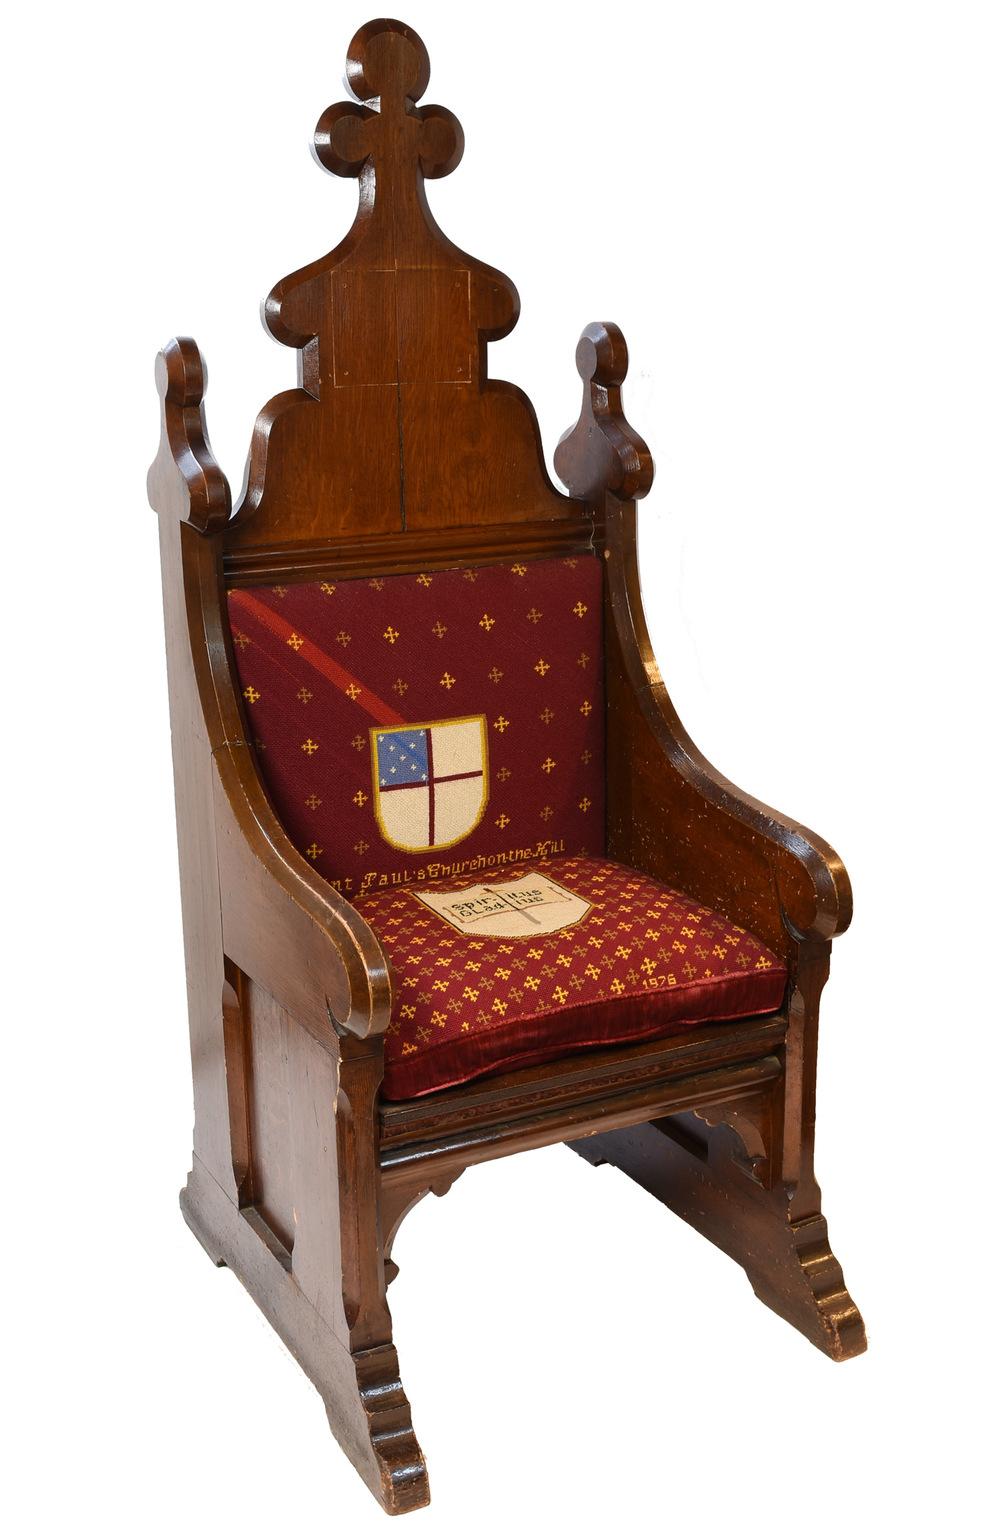 46367-needlepoint-chair-spiritus-gladius-front-angle.jpg